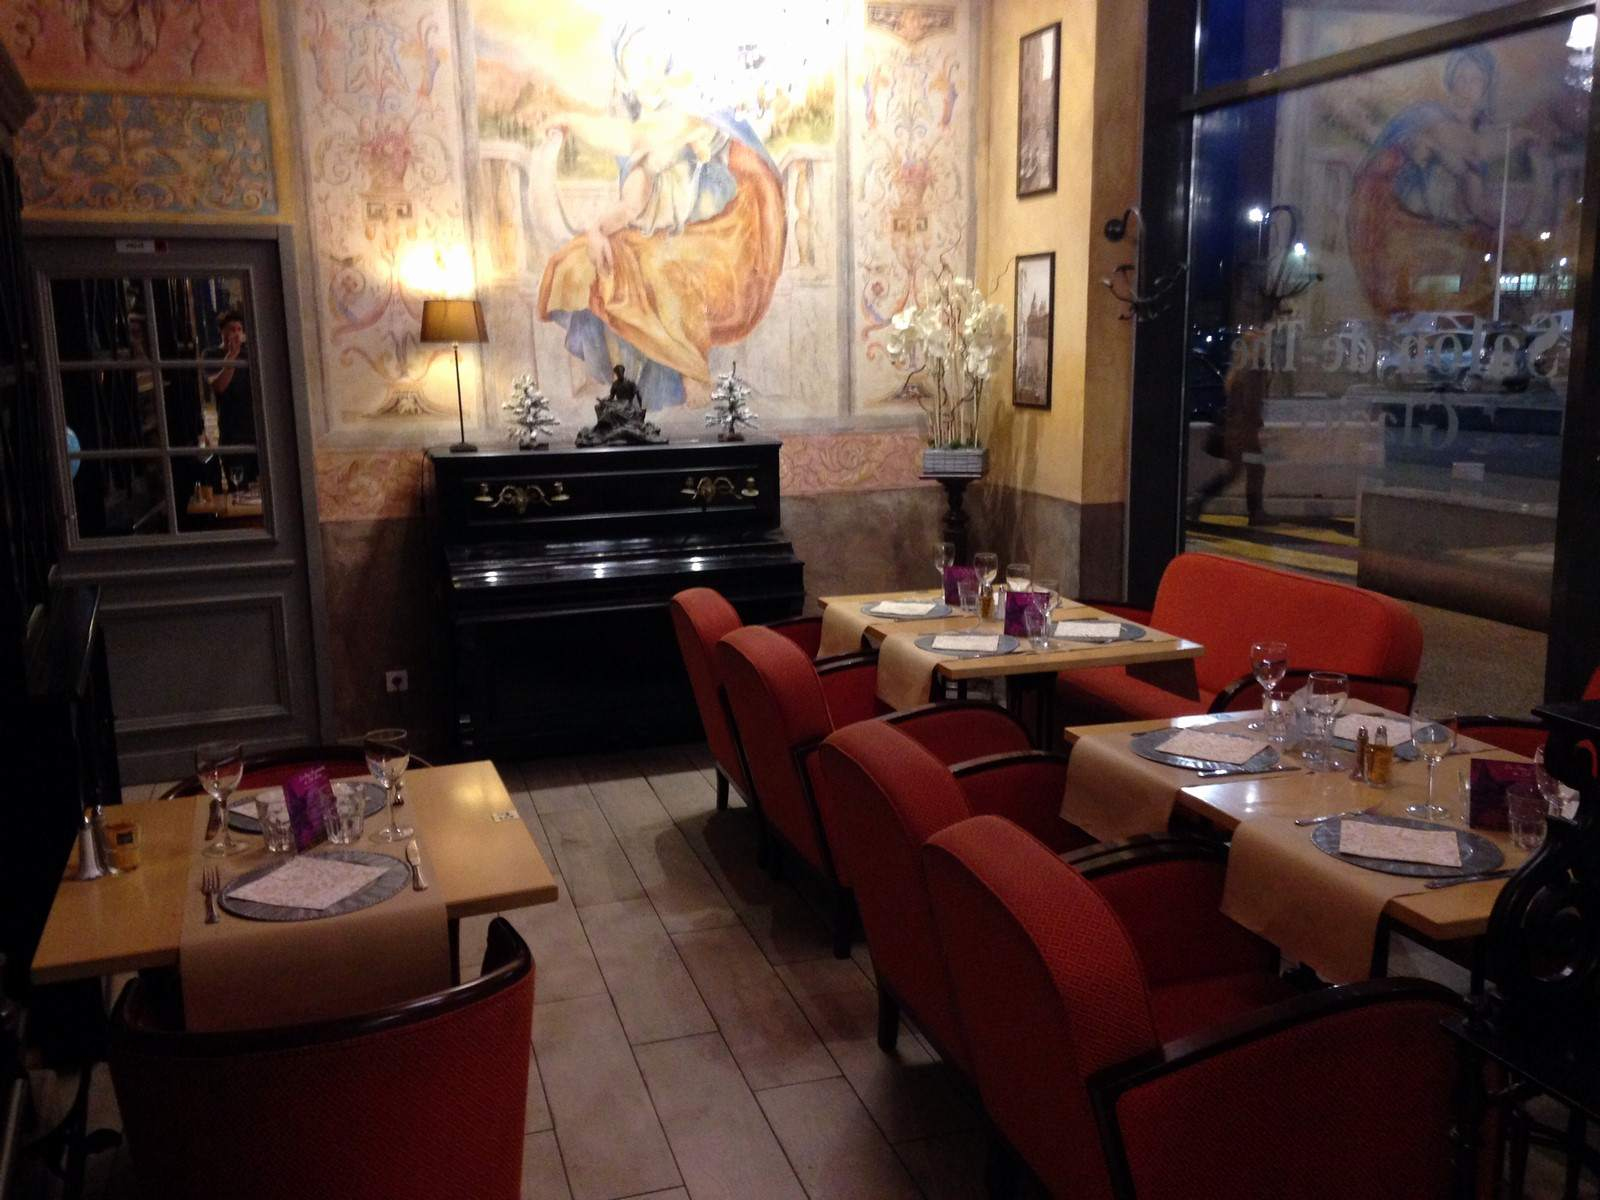 Fiche Crap Cuisine Impressionnant Image Galerie De Cuisine Jardin Mpi Stuttering Treatment